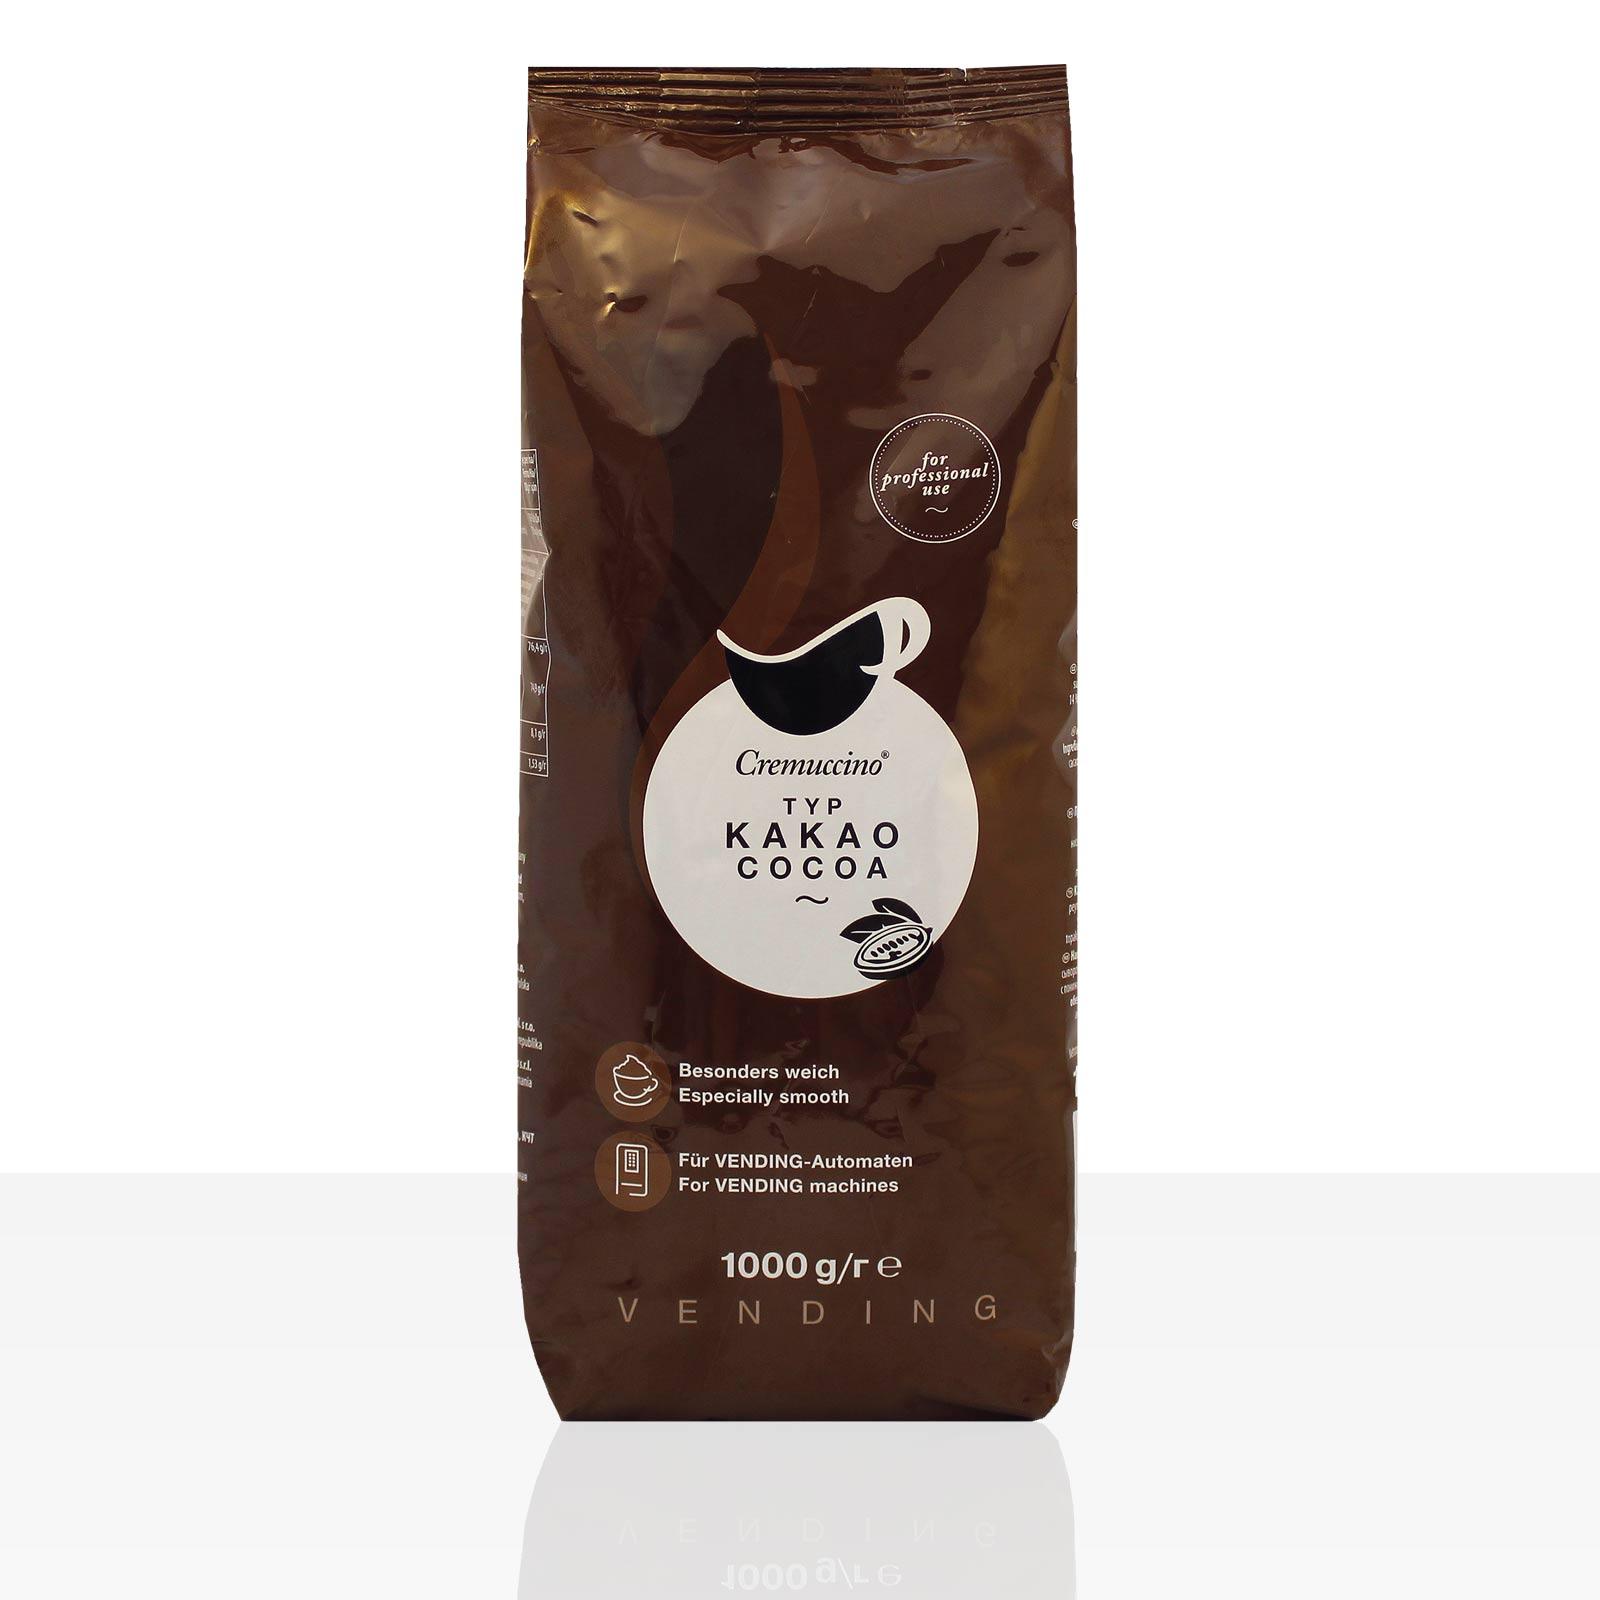 Tchibo Cremuccino Kakao Cocoa 1kg, Vending 14% Kakaopulver für Automaten